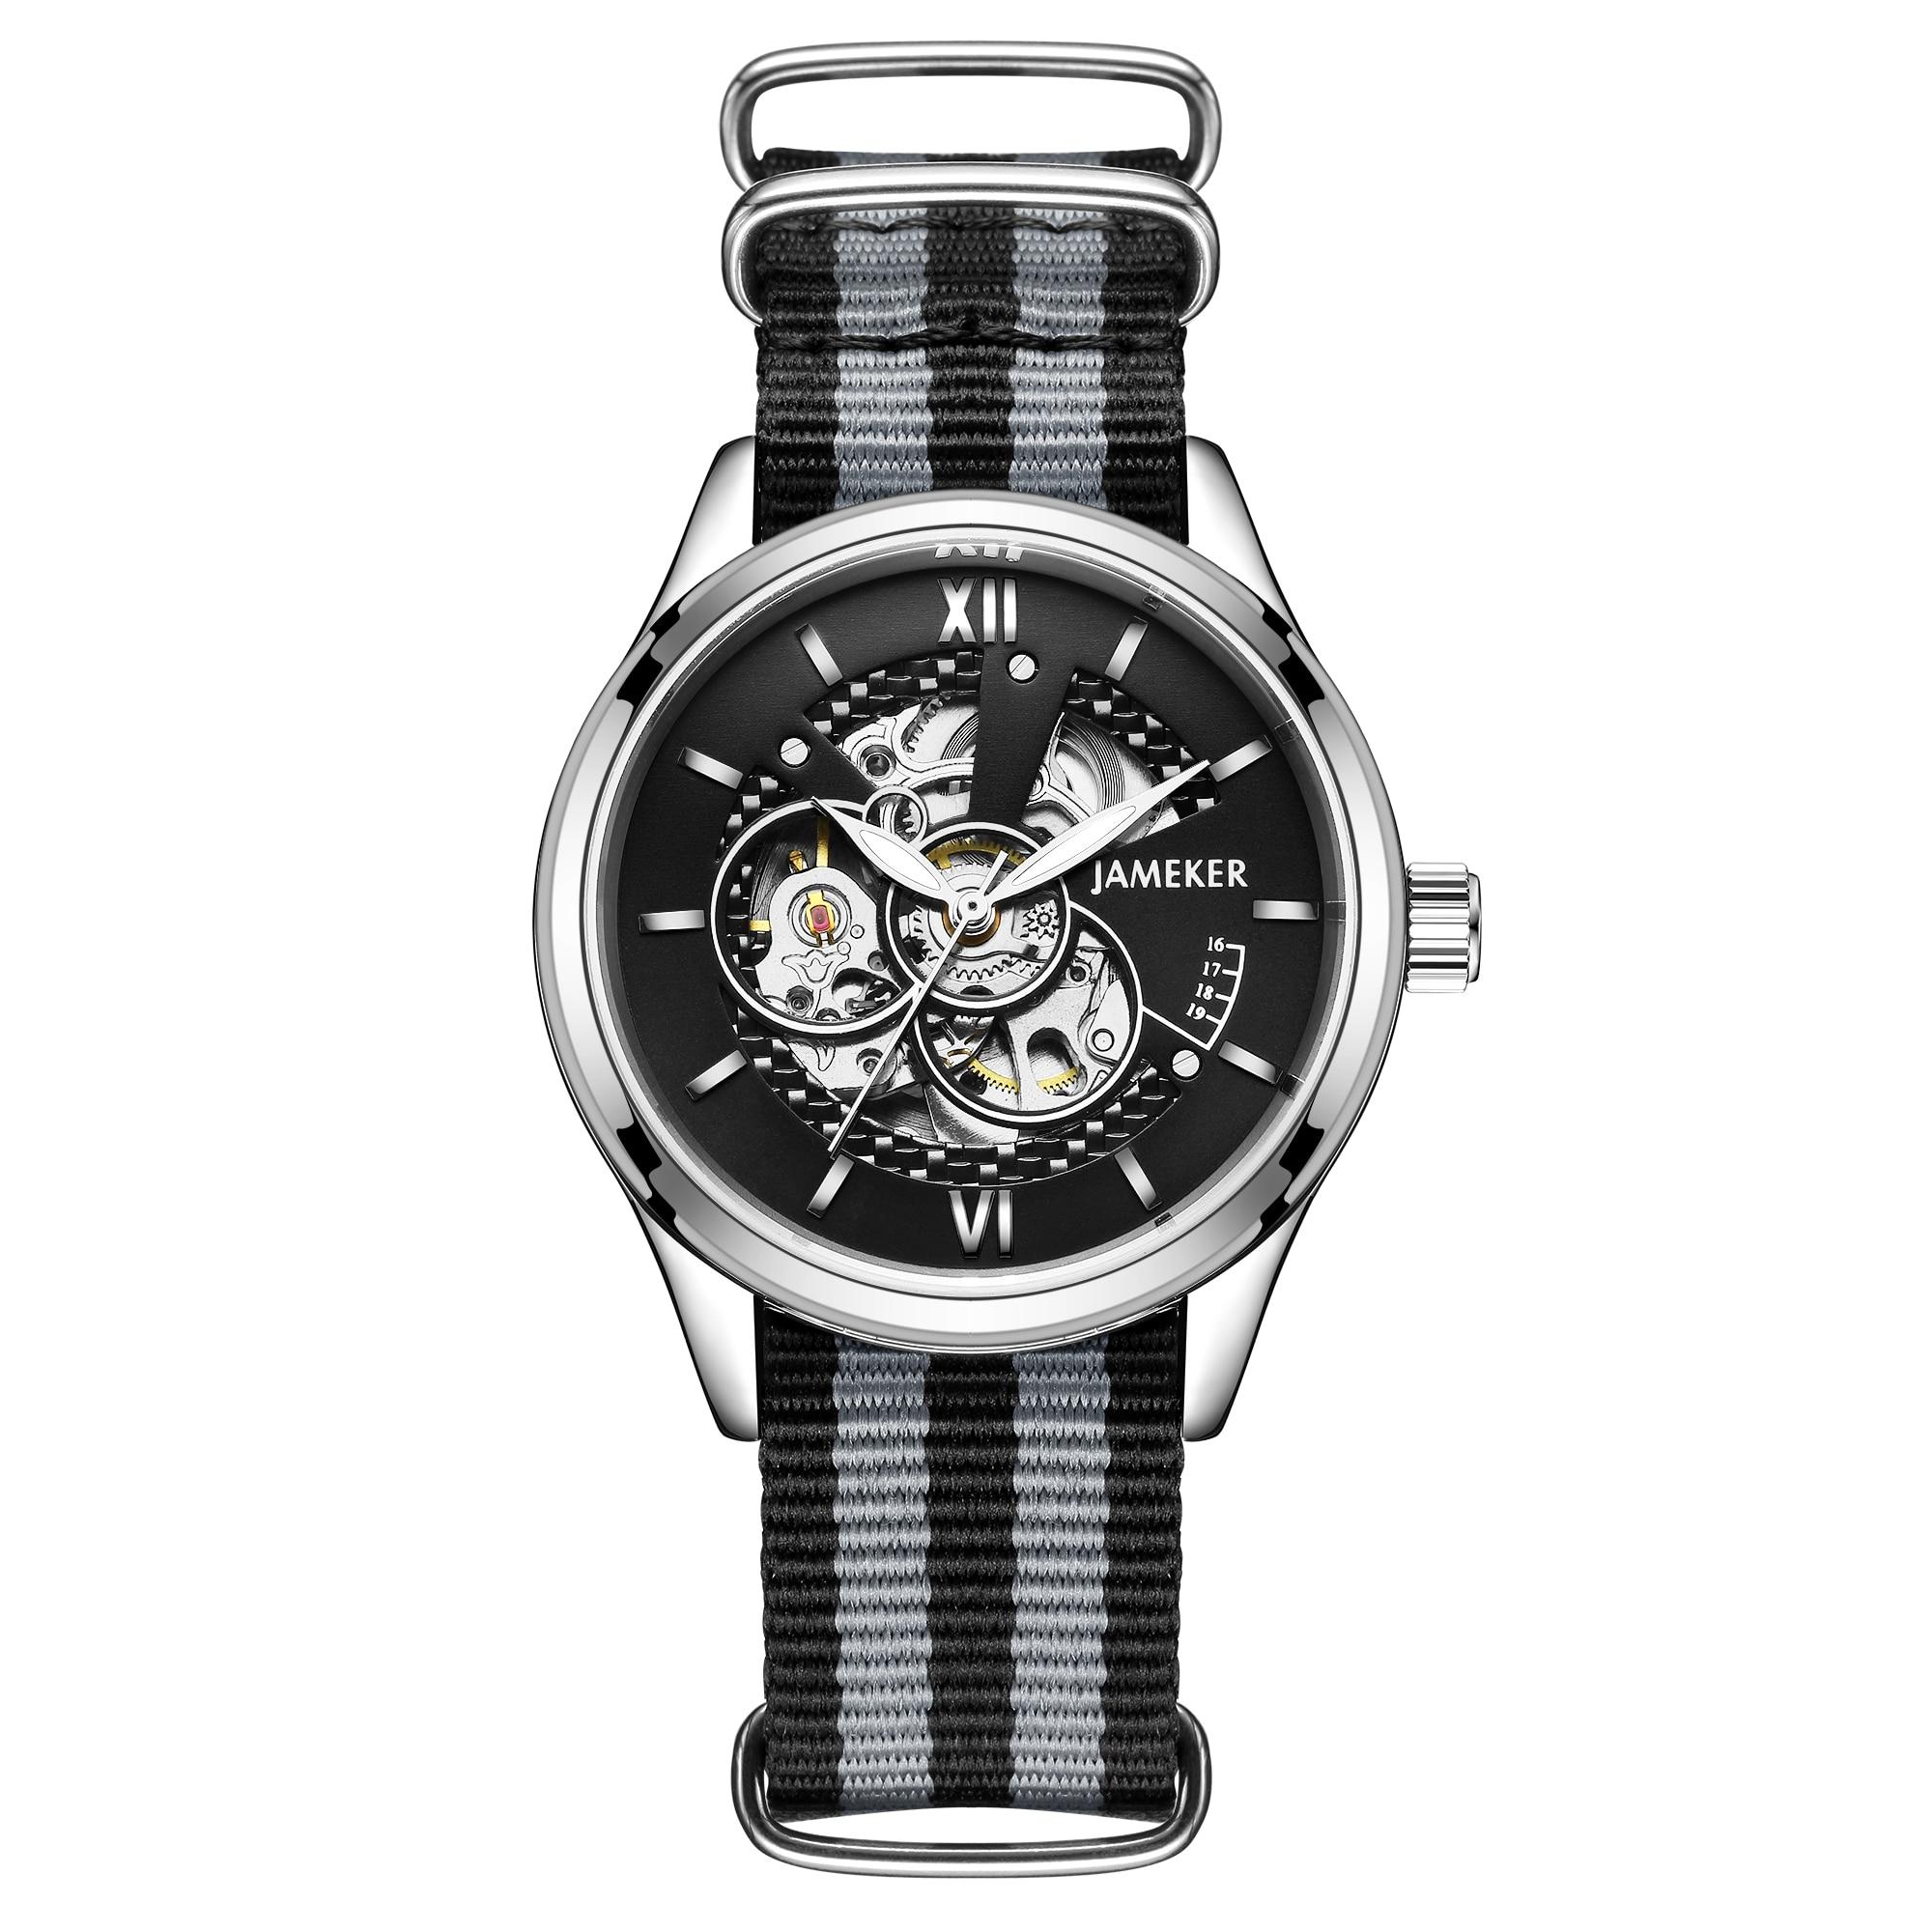 Reloj hombre 2019 zegarek damski correa de Nylon deporte automático reloj hombres reloj esqueleto relojes mecánicos hombre reloj caja de regalo